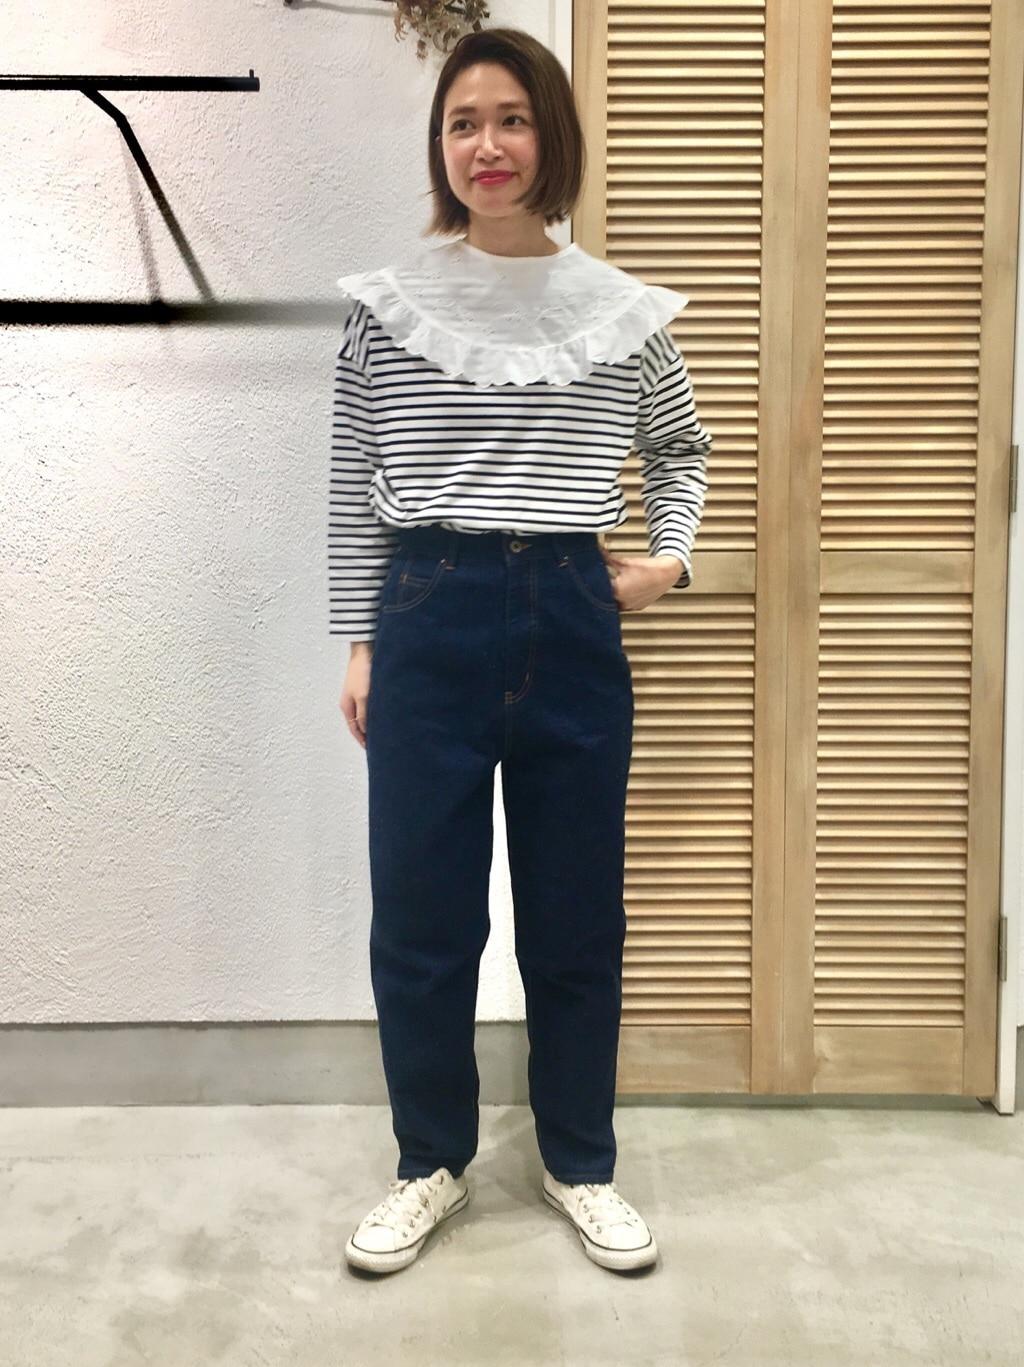 chambre de charme 横浜ジョイナス 身長:160cm 2021.01.21